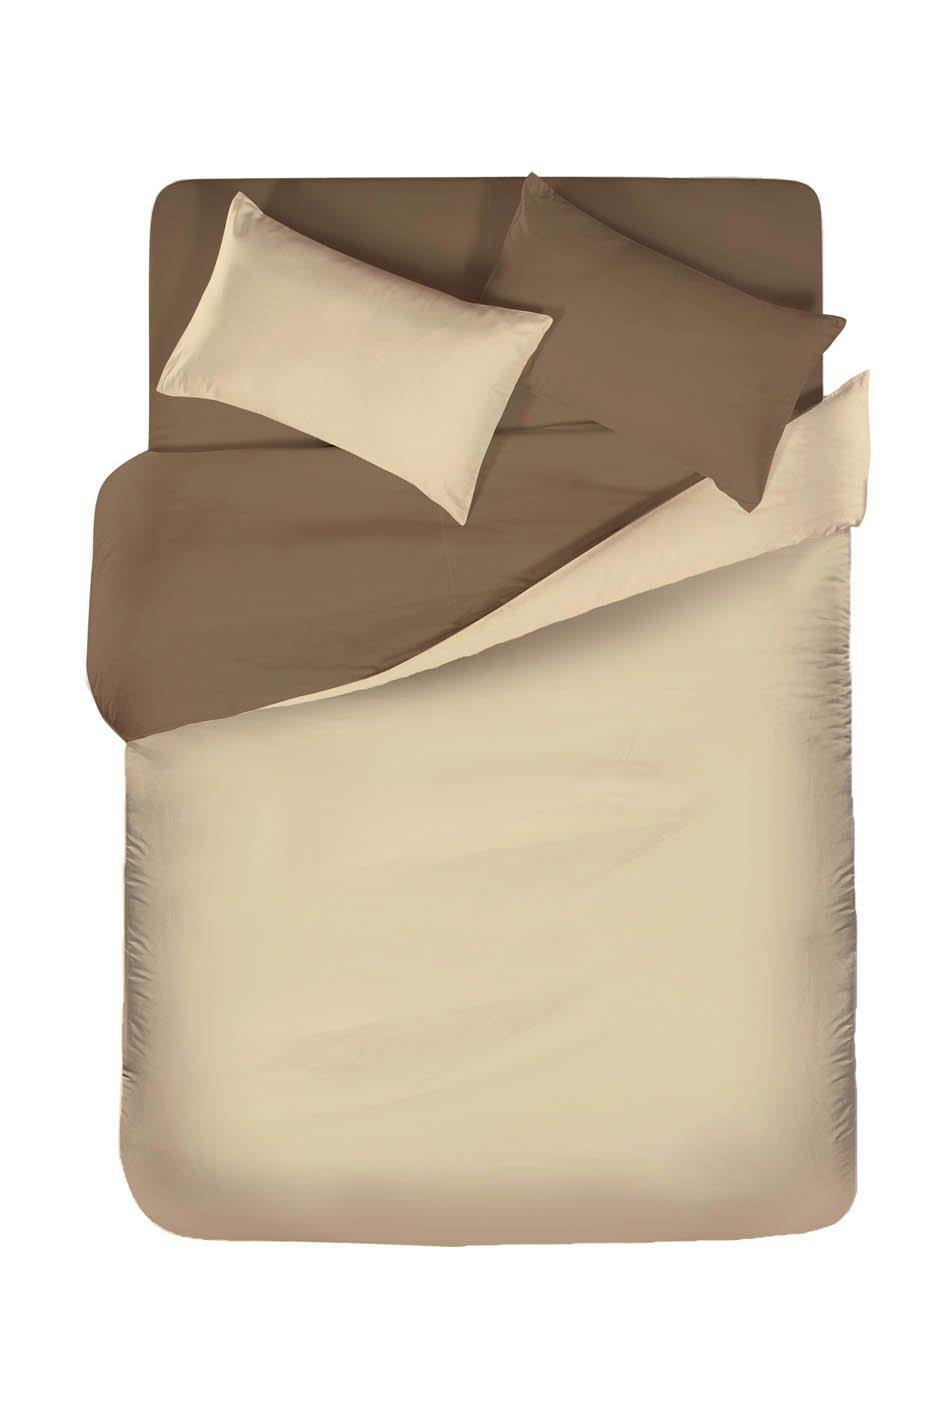 Daphne Luxury Style Polyester and Cotton Sheet Set 6876 Jacquard Bedding Set image1